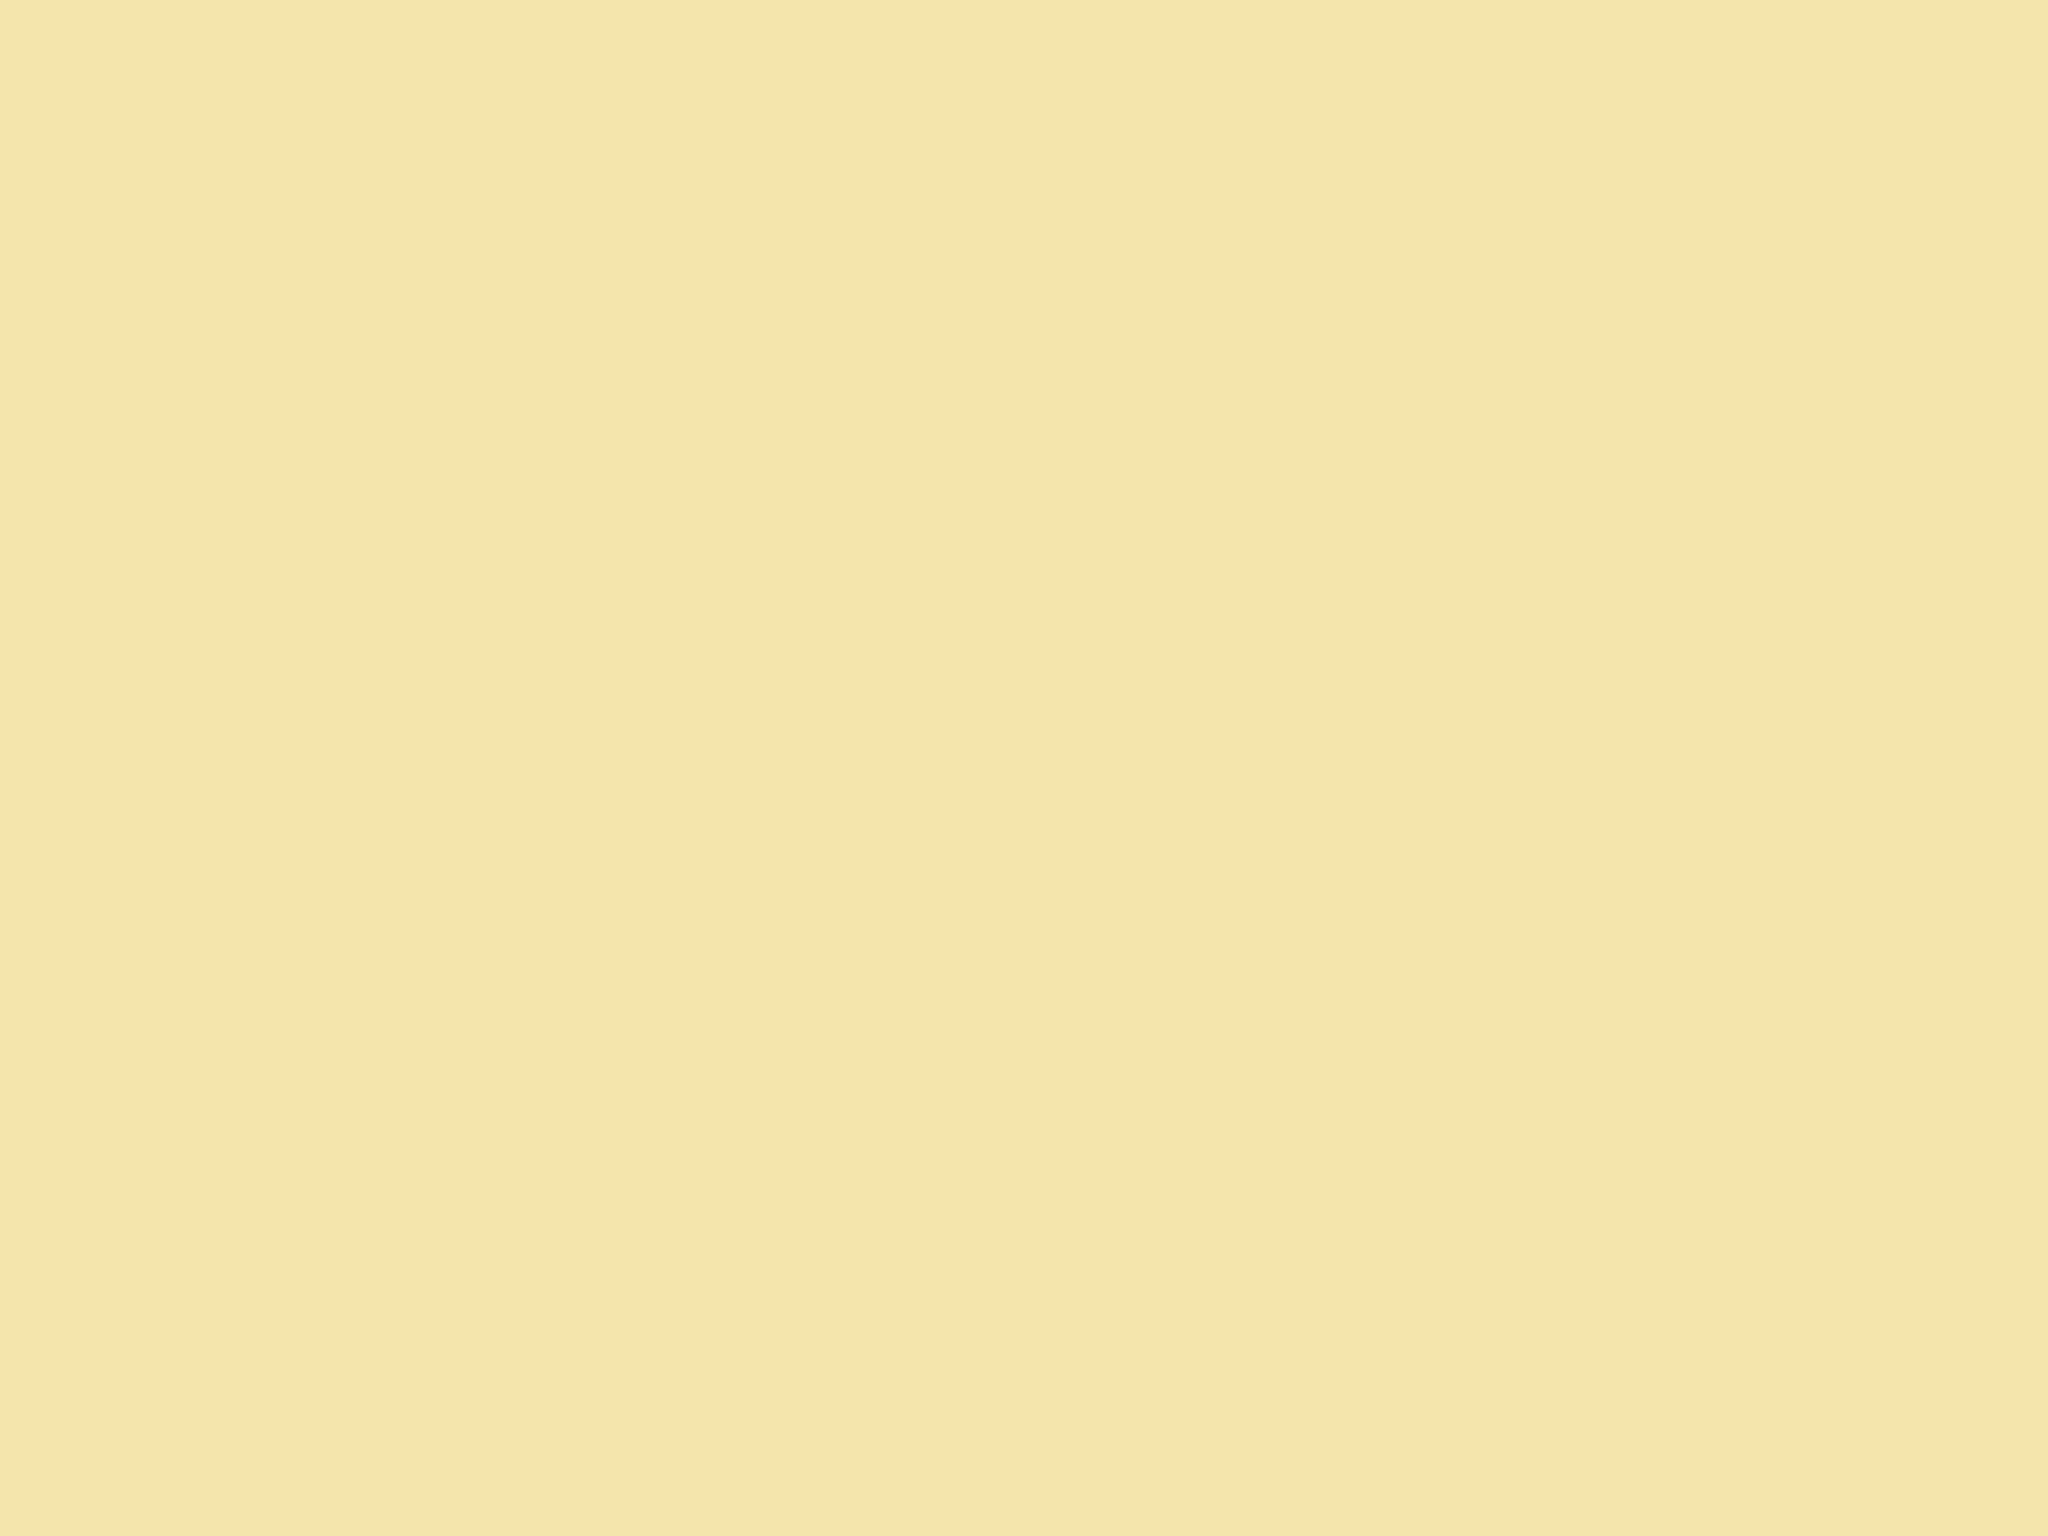 2048x1536 Vanilla Solid Color Background